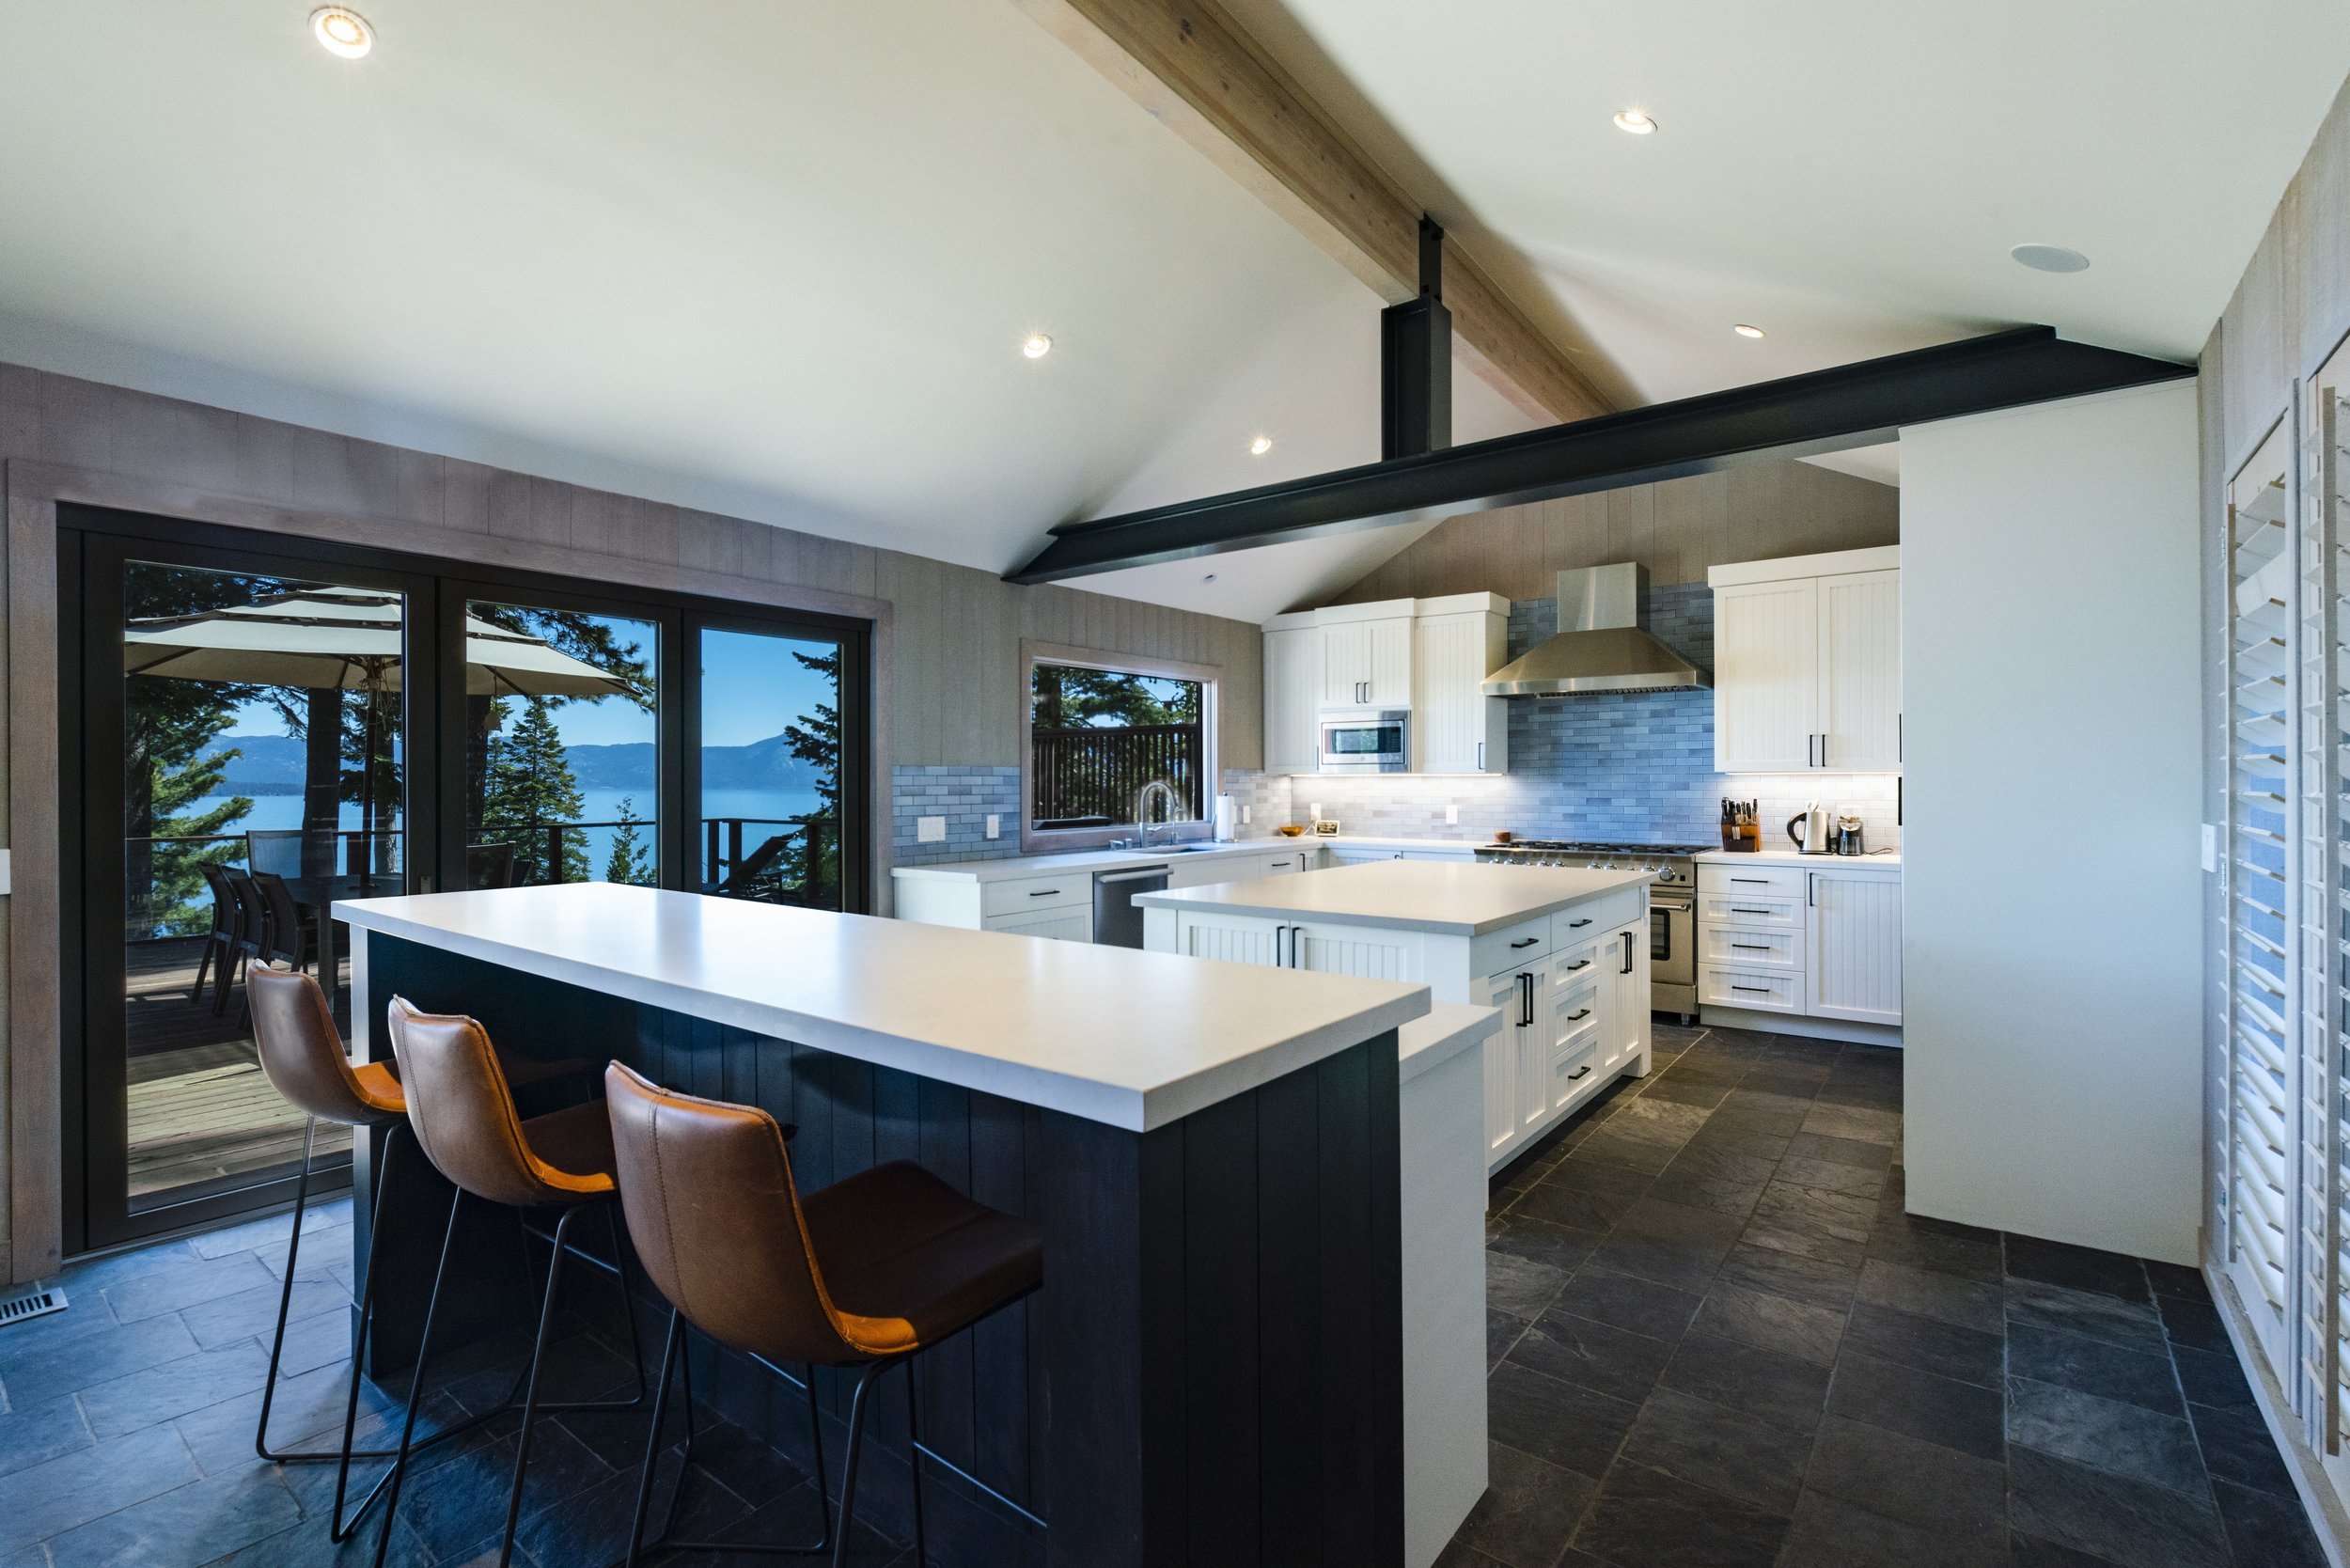 x3-Hartline-Construction-184-Edgewood-Kitchen.jpg